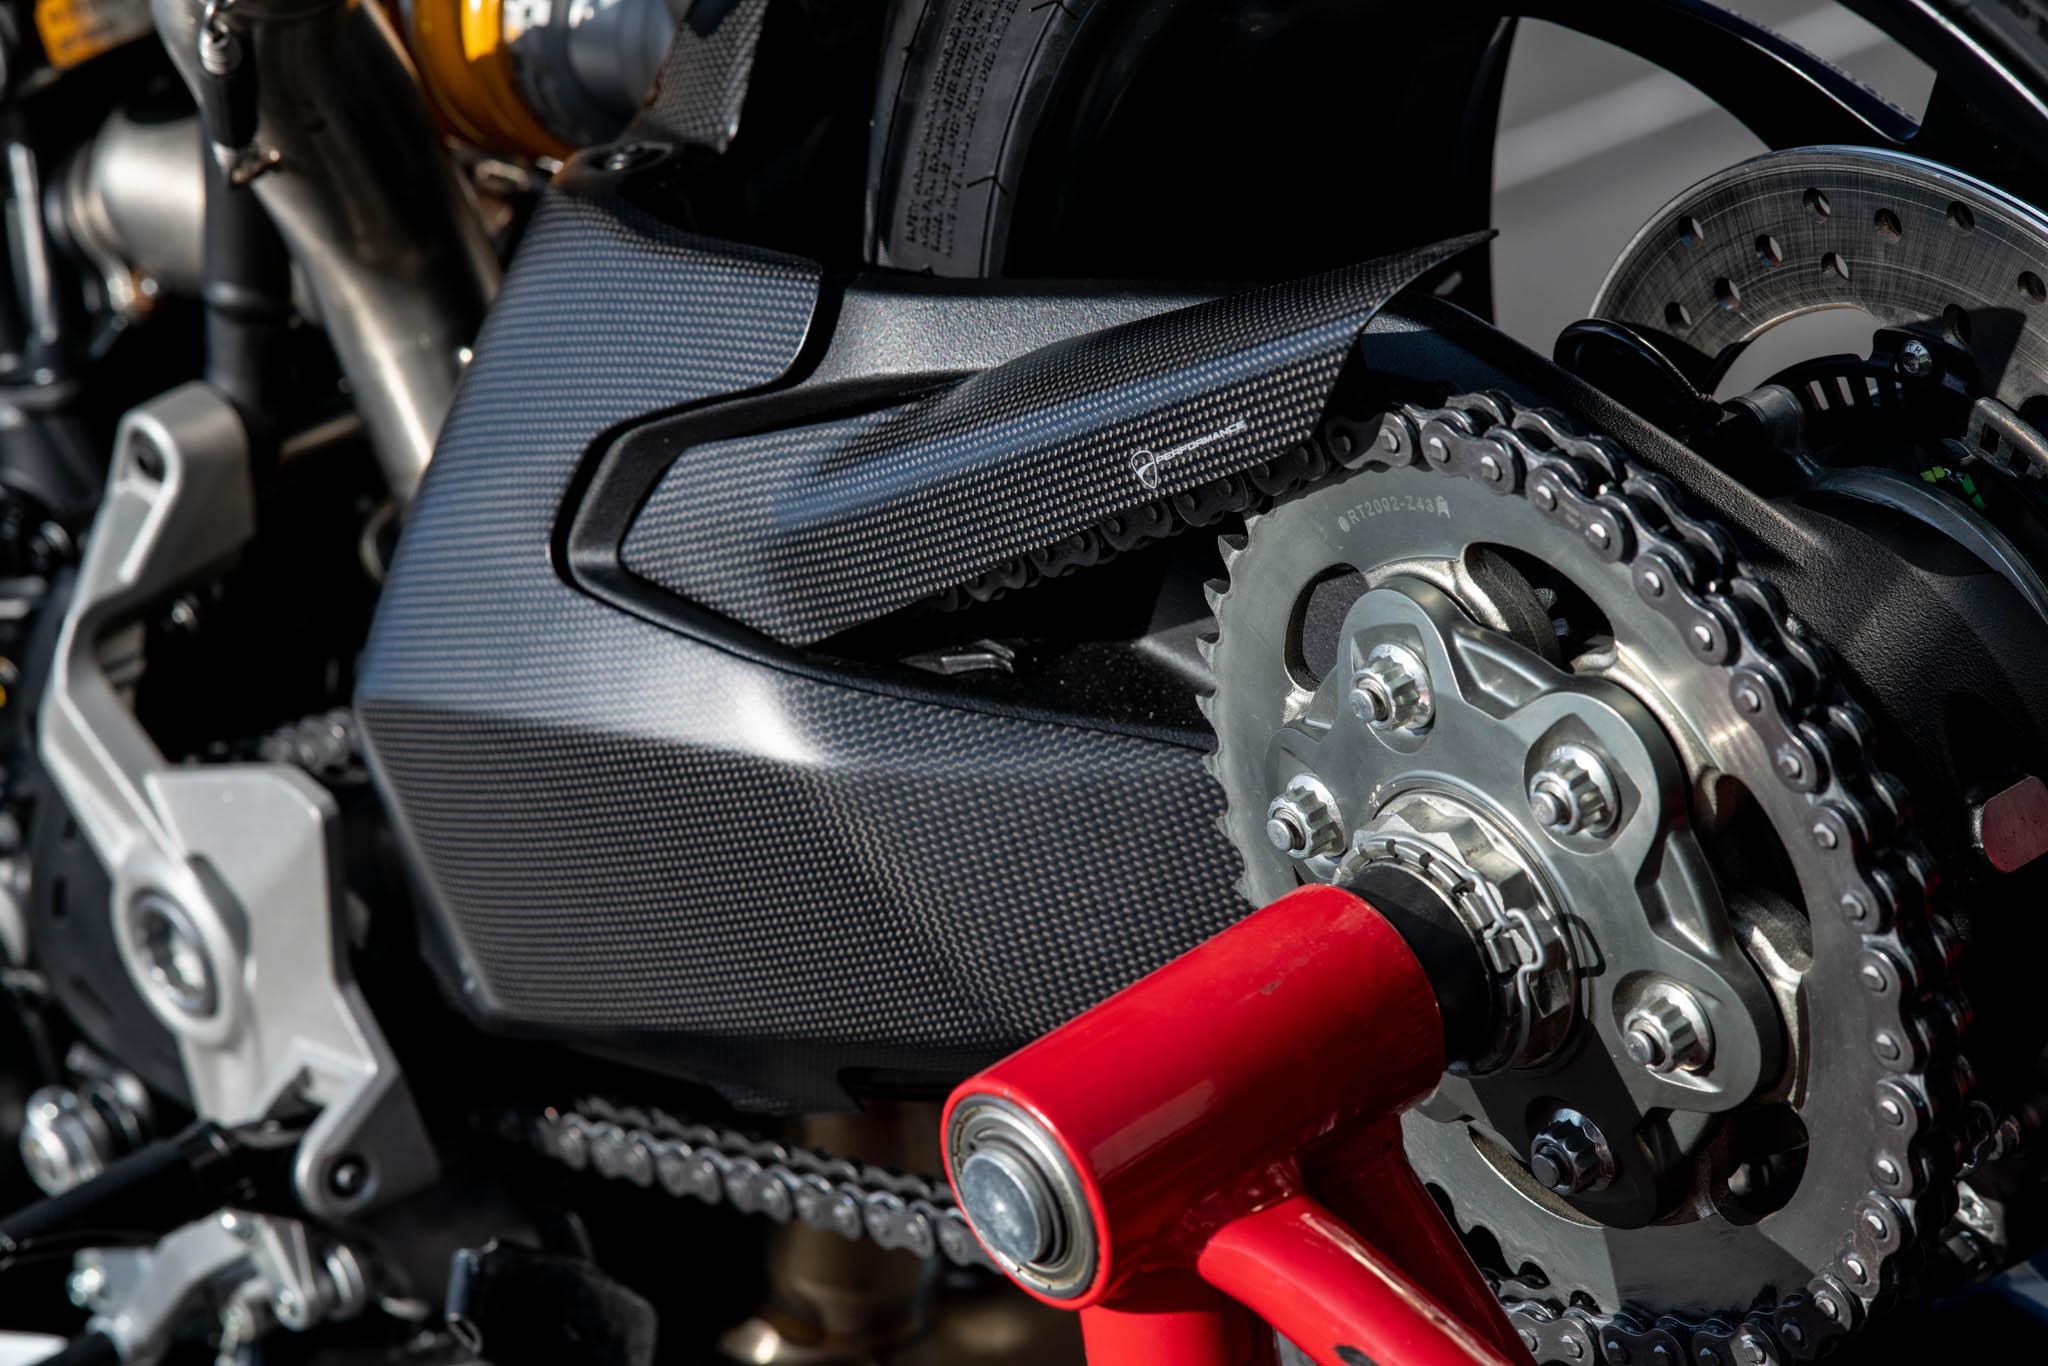 Ducati_SuperSport_950_2021_Performance-7